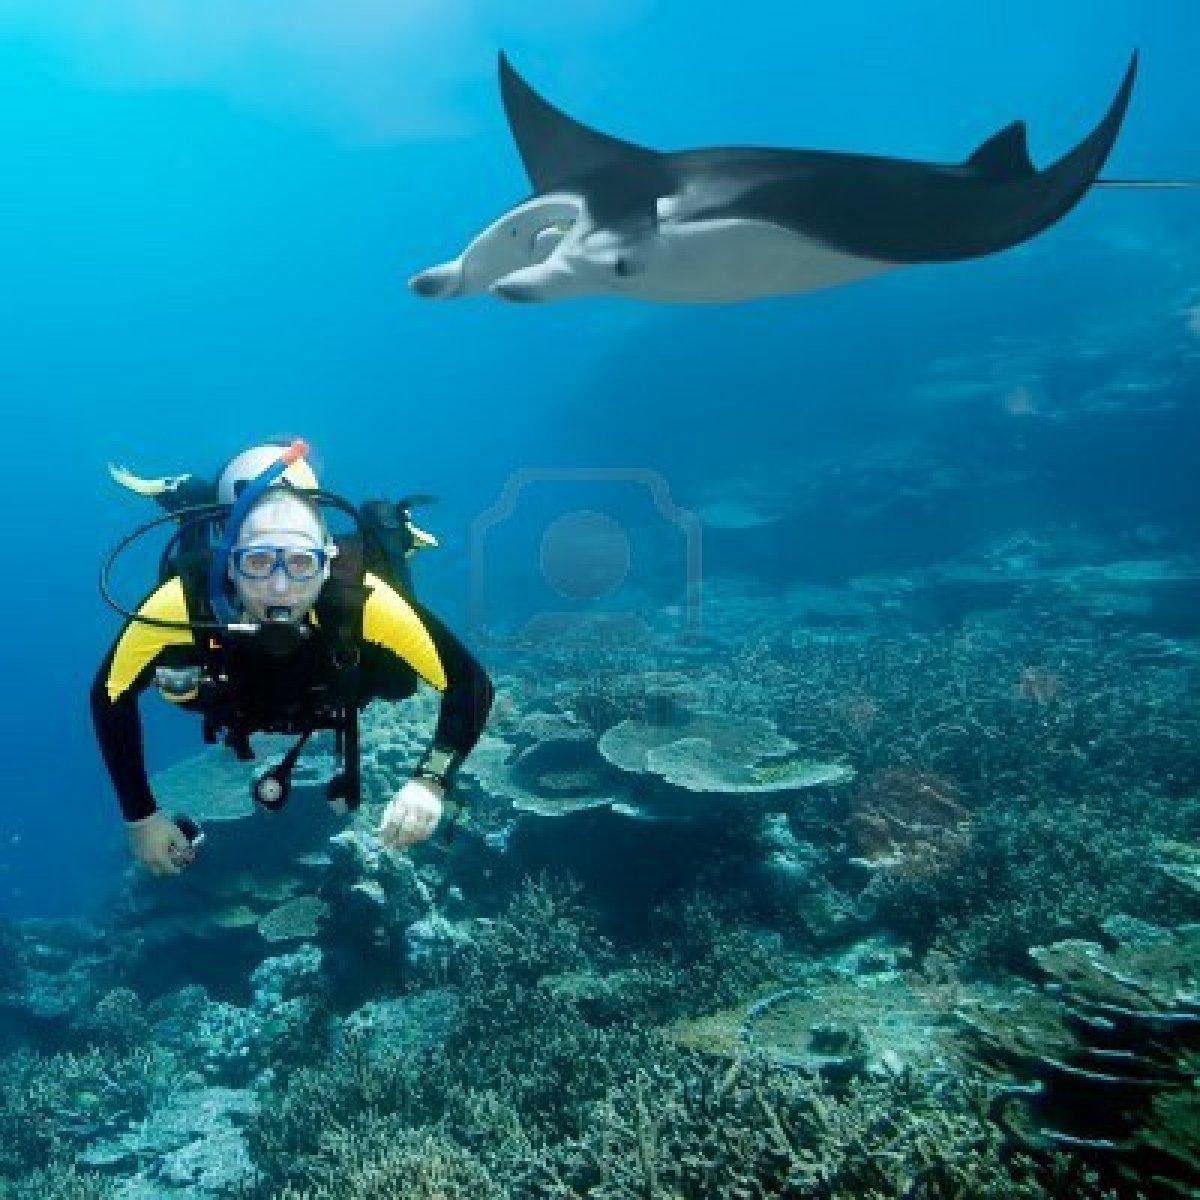 http://3.bp.blogspot.com/-98sI_1Ue_lw/TtzqFvHKkTI/AAAAAAAAA0s/rw0DBwgVn4M/s1600/coral-reef-background-1-794422.jpg